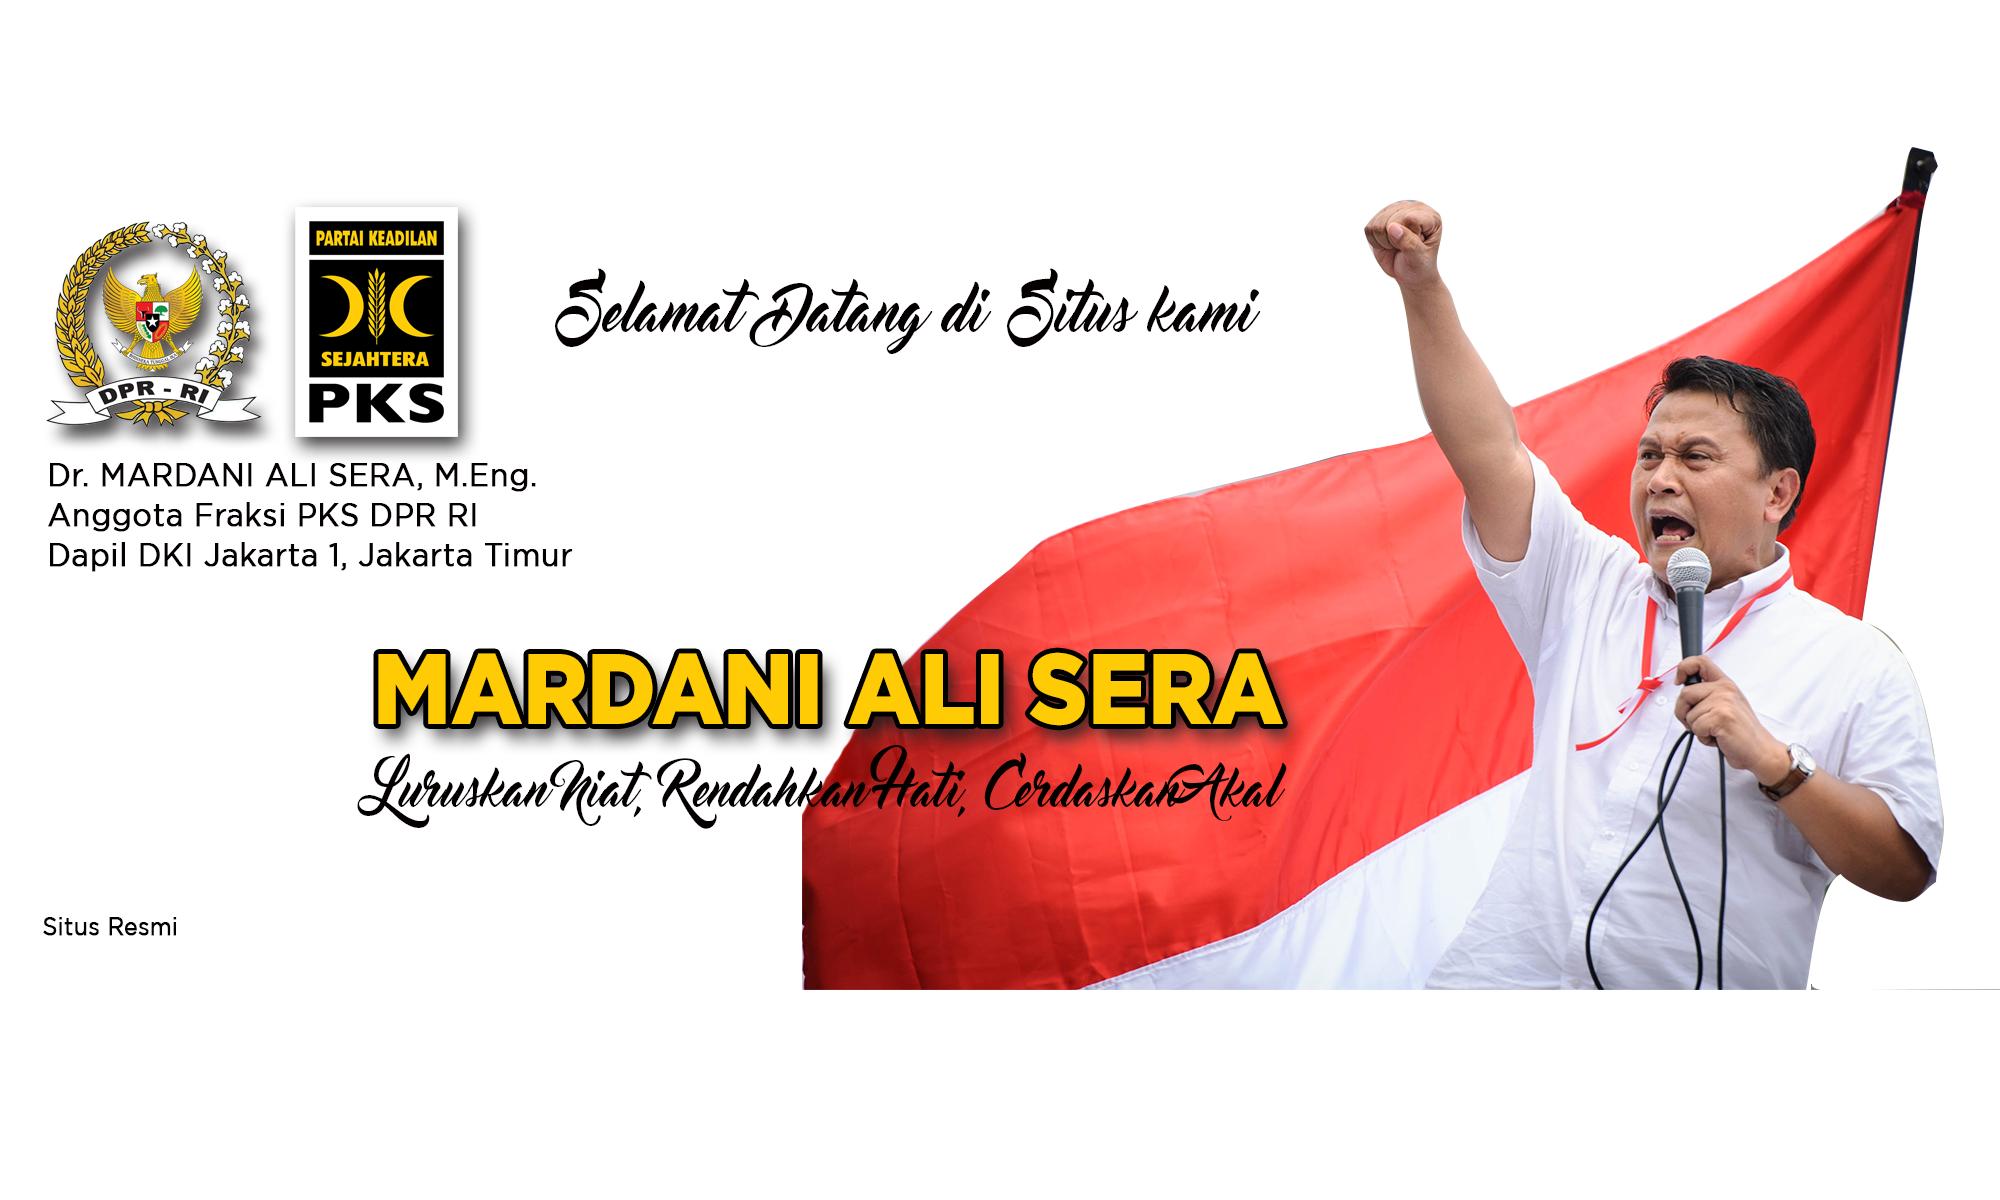 Mardani Ali Sera